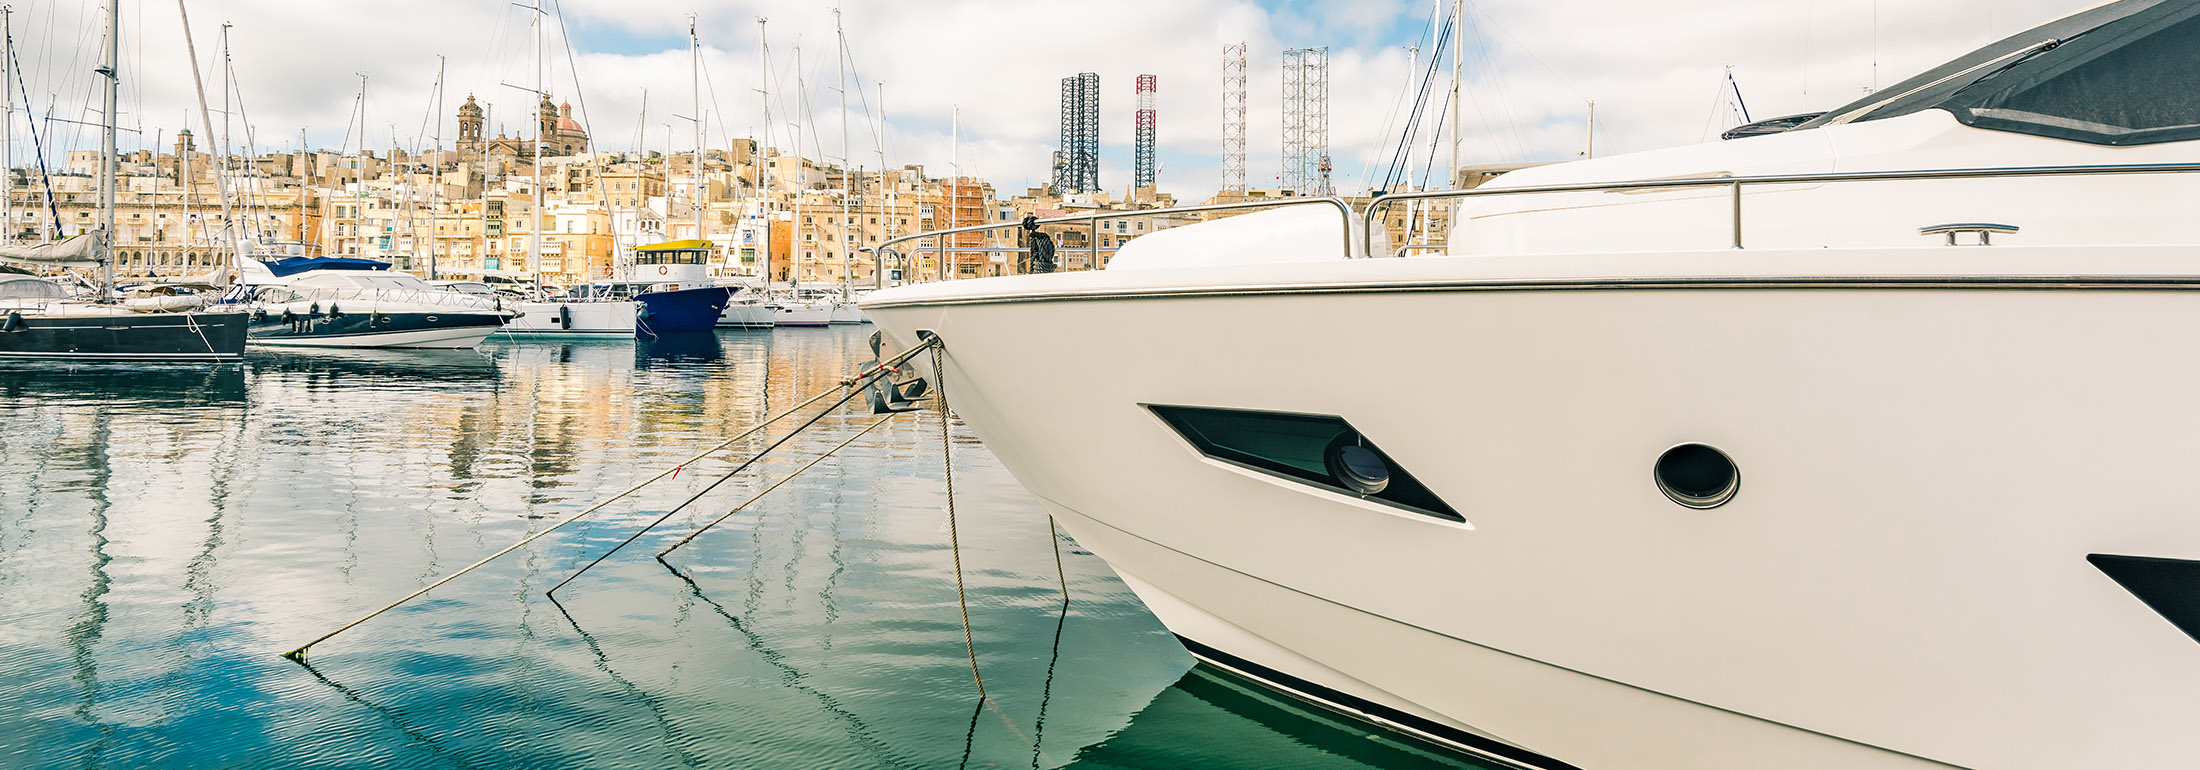 denizpazari com ikinci el tekne yeni